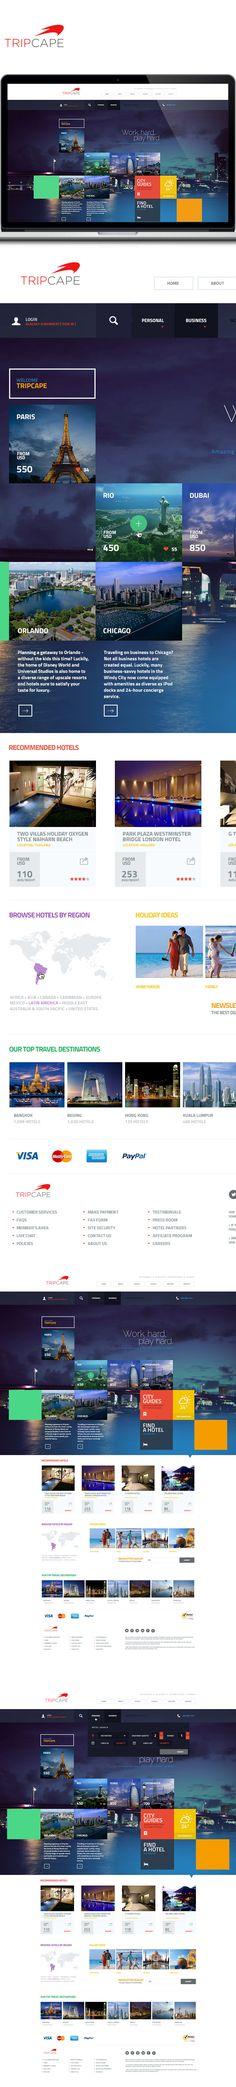 Tripcape on Behance #ui #mobile #design #ResponsiveDesign #Web #UI #UX…